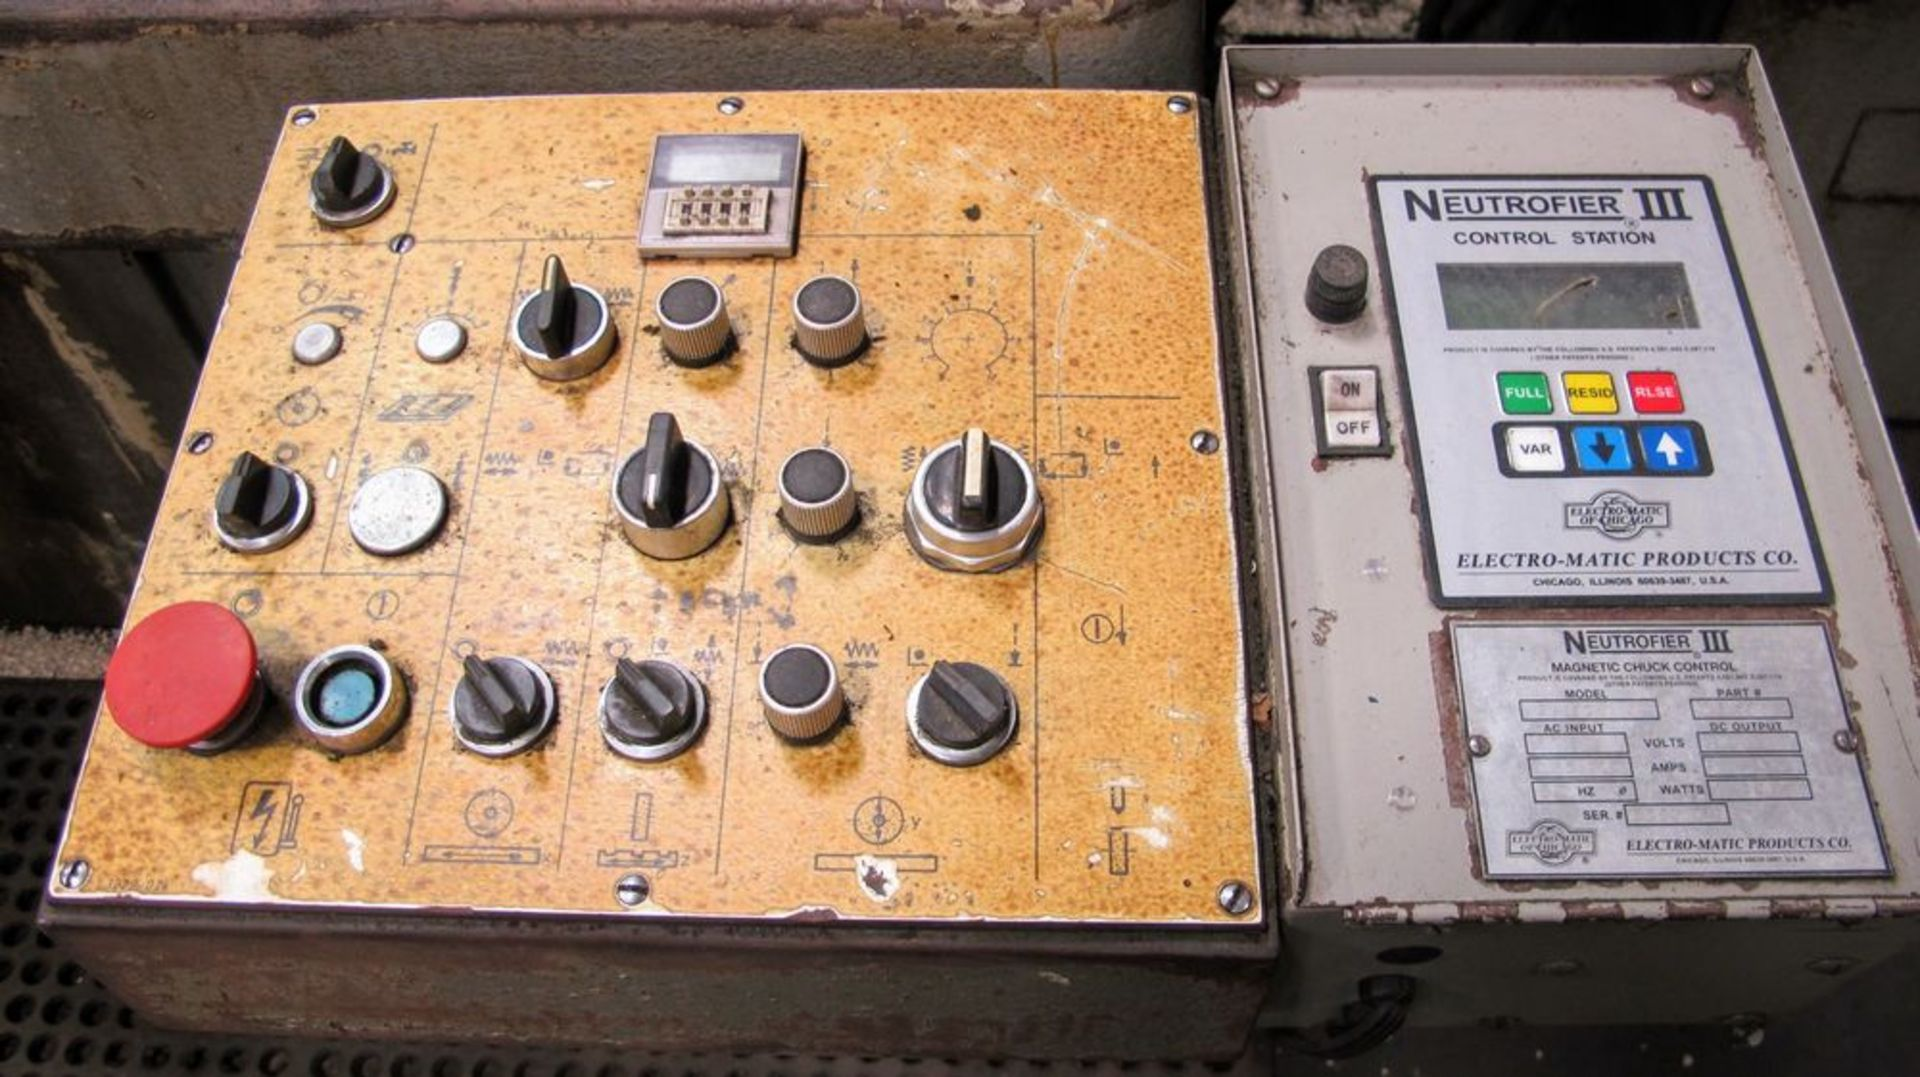 "Lot 109 - BLOHM-HFS Surface Grinder, 20"" x 48"" Magnetic Chuck, s/n 1101008, Neutrofier III Control Station"